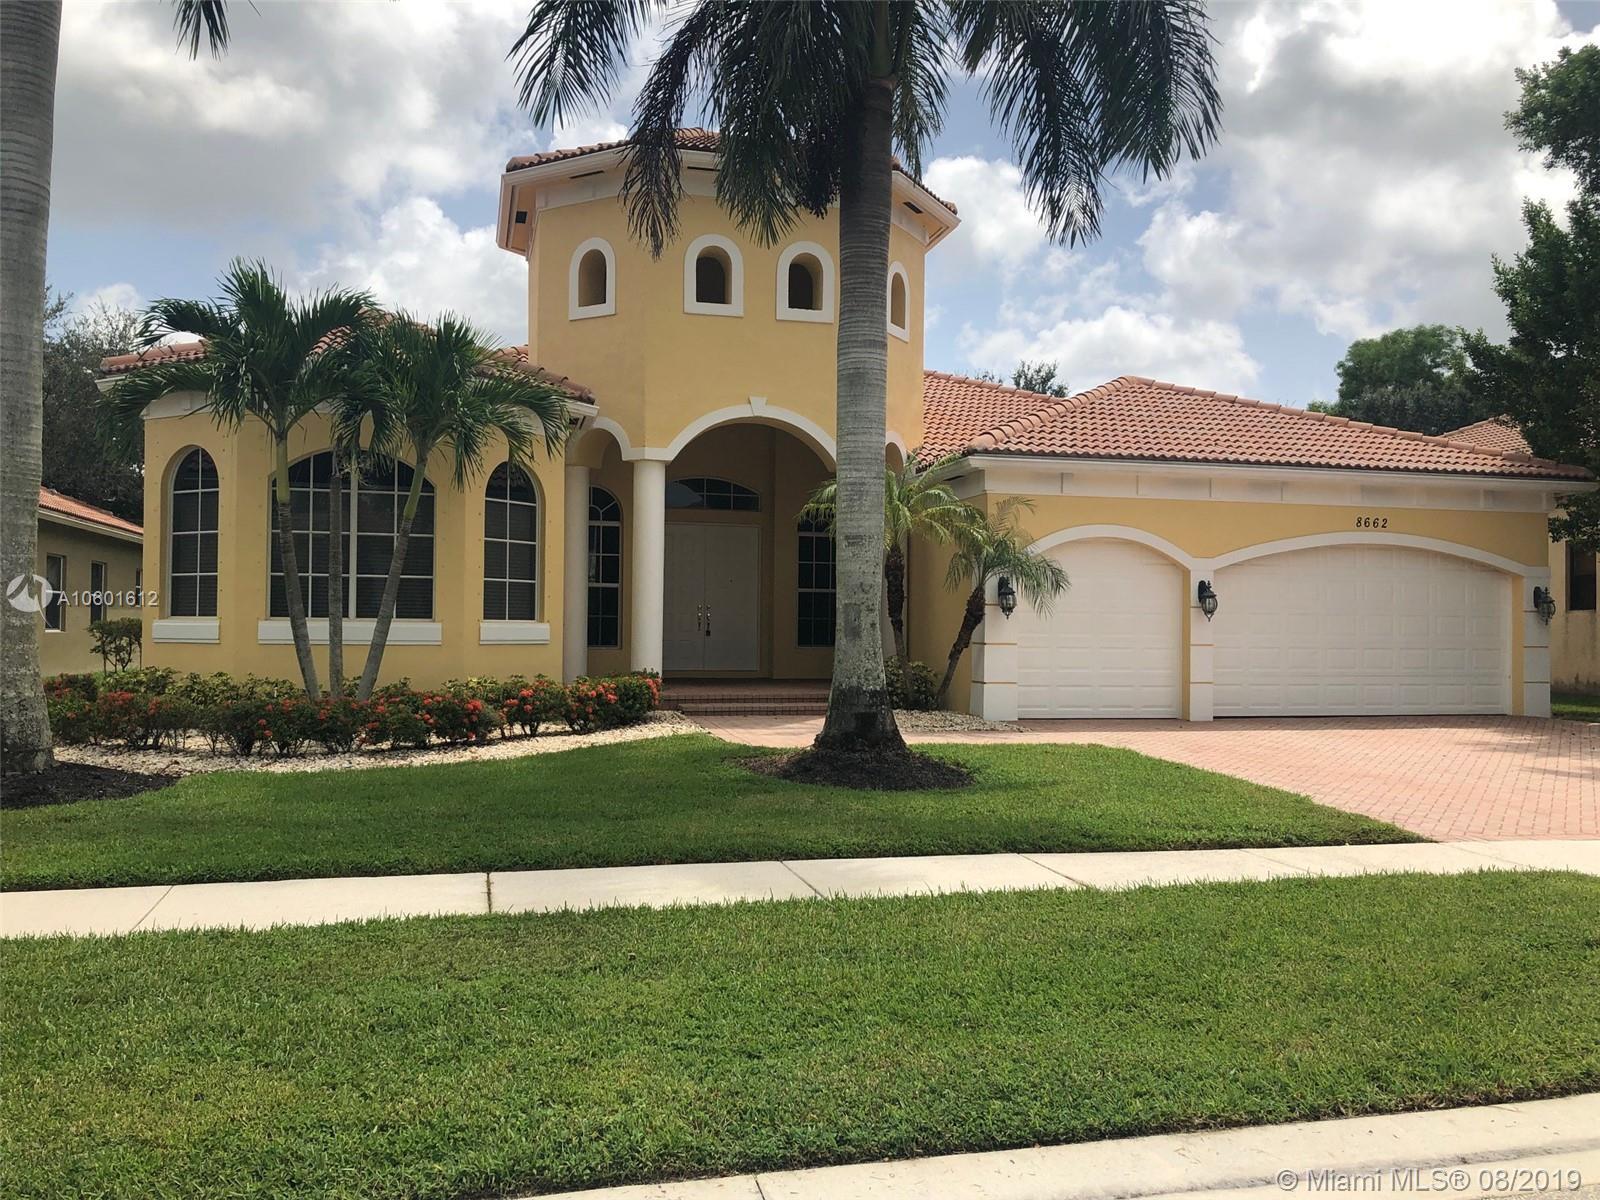 8662 Club Estates Way, Lake Worth, FL 33467